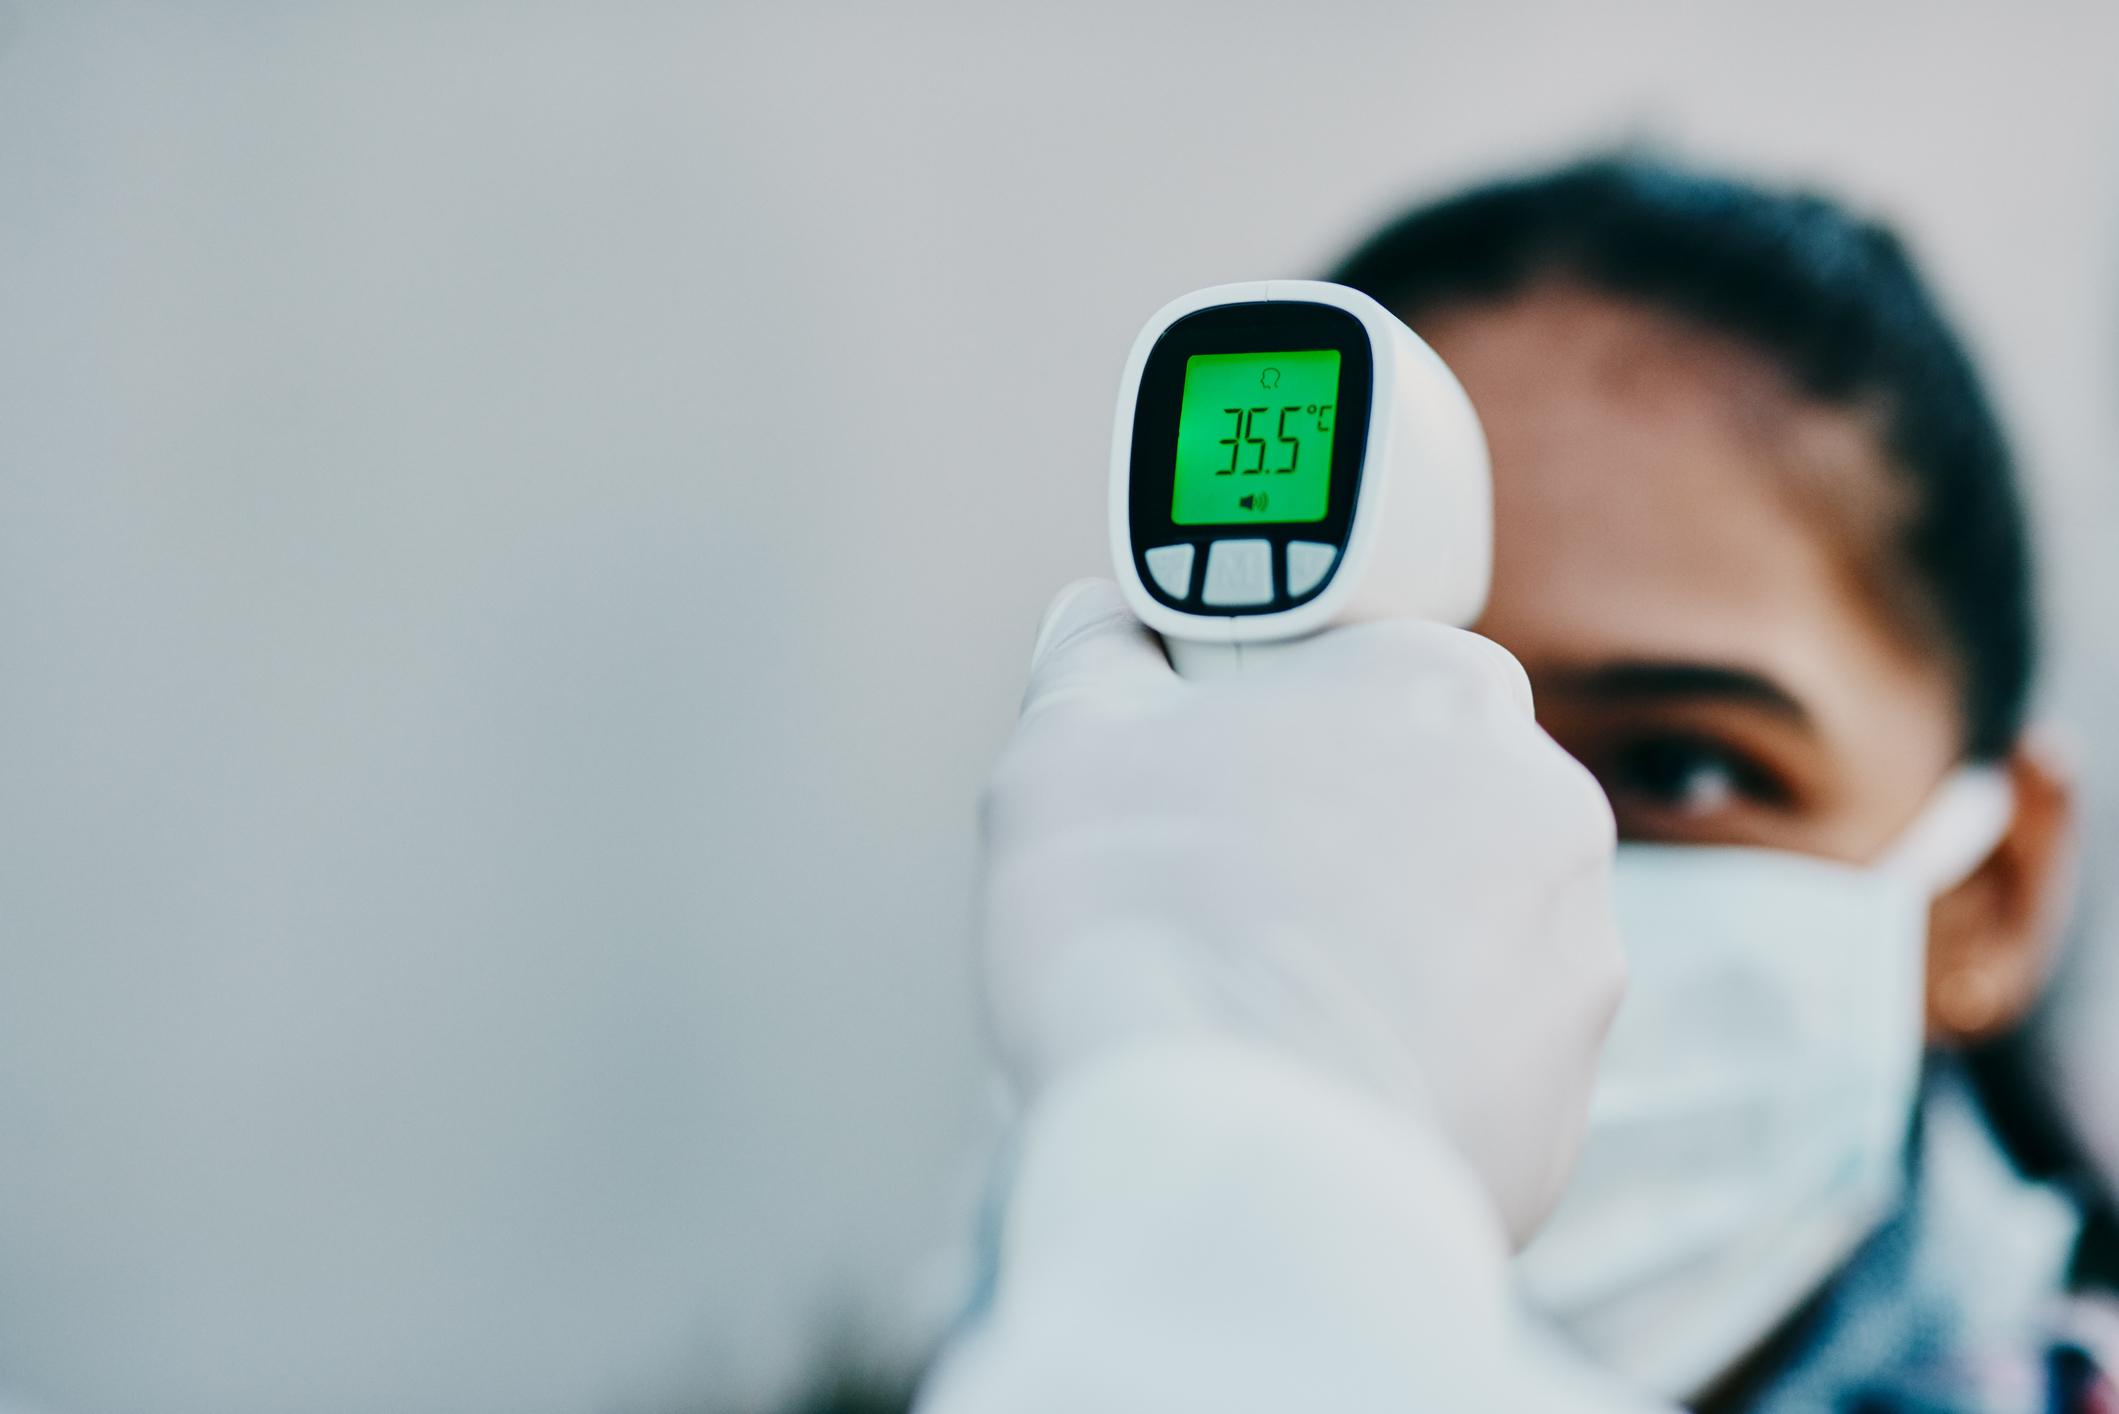 Coronavirus FAQs: Temperature Screenings, Swimming Pool Risks, Mosquitoes ...? : Goats and Soda : NPR